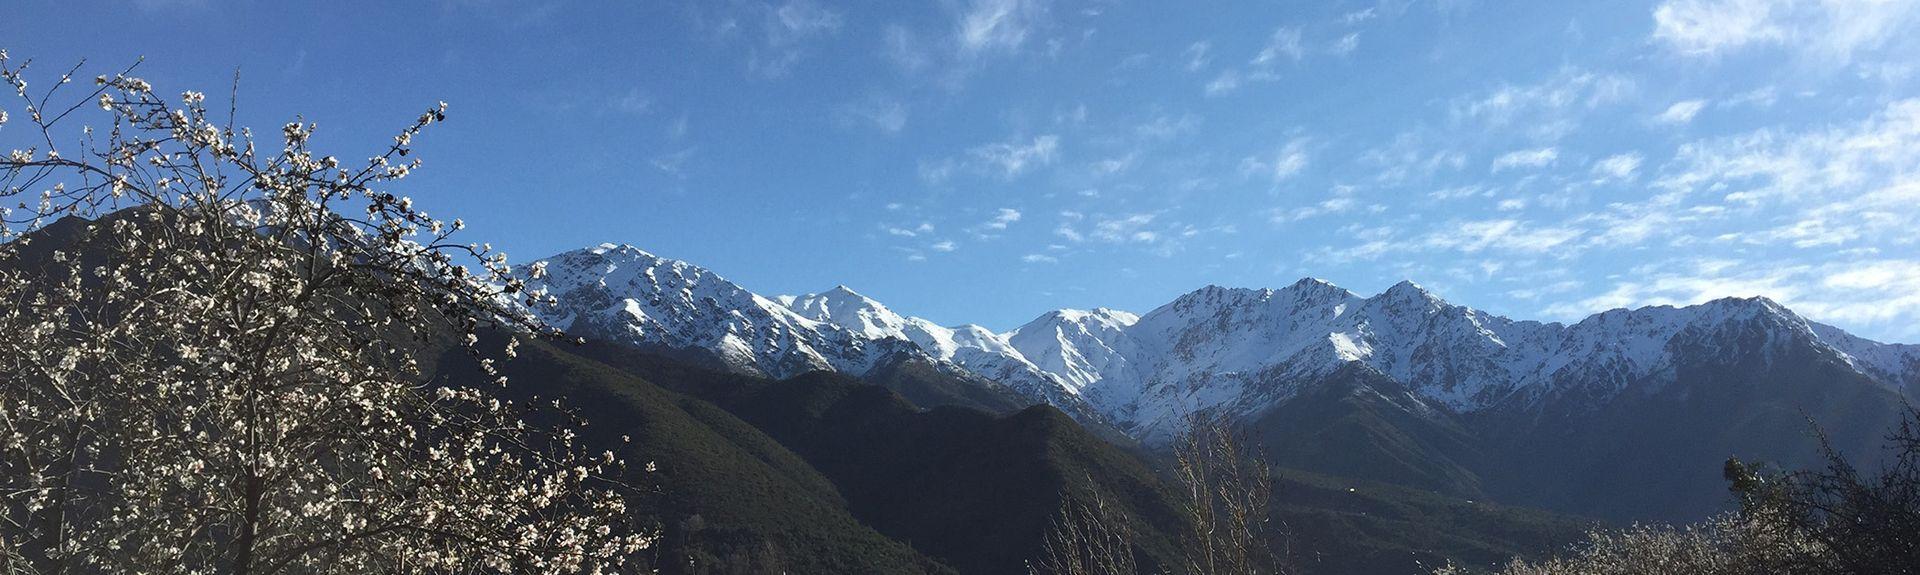 Pirque, Pirque, Santiago Metropolitan Region, Chile